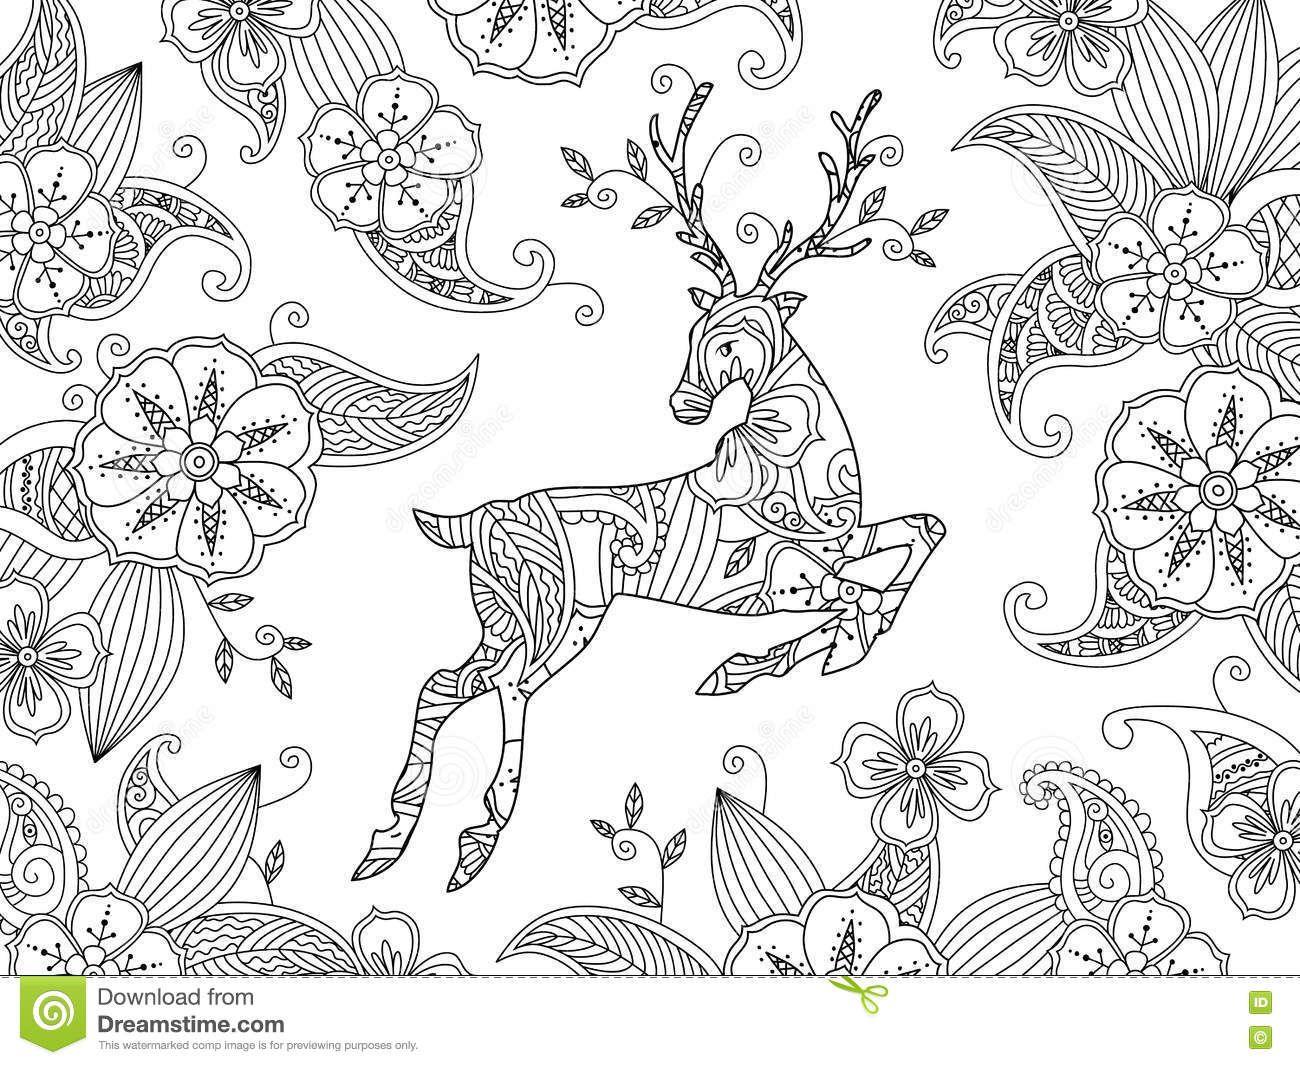 Pin de Barbara en coloring deer | Pinterest